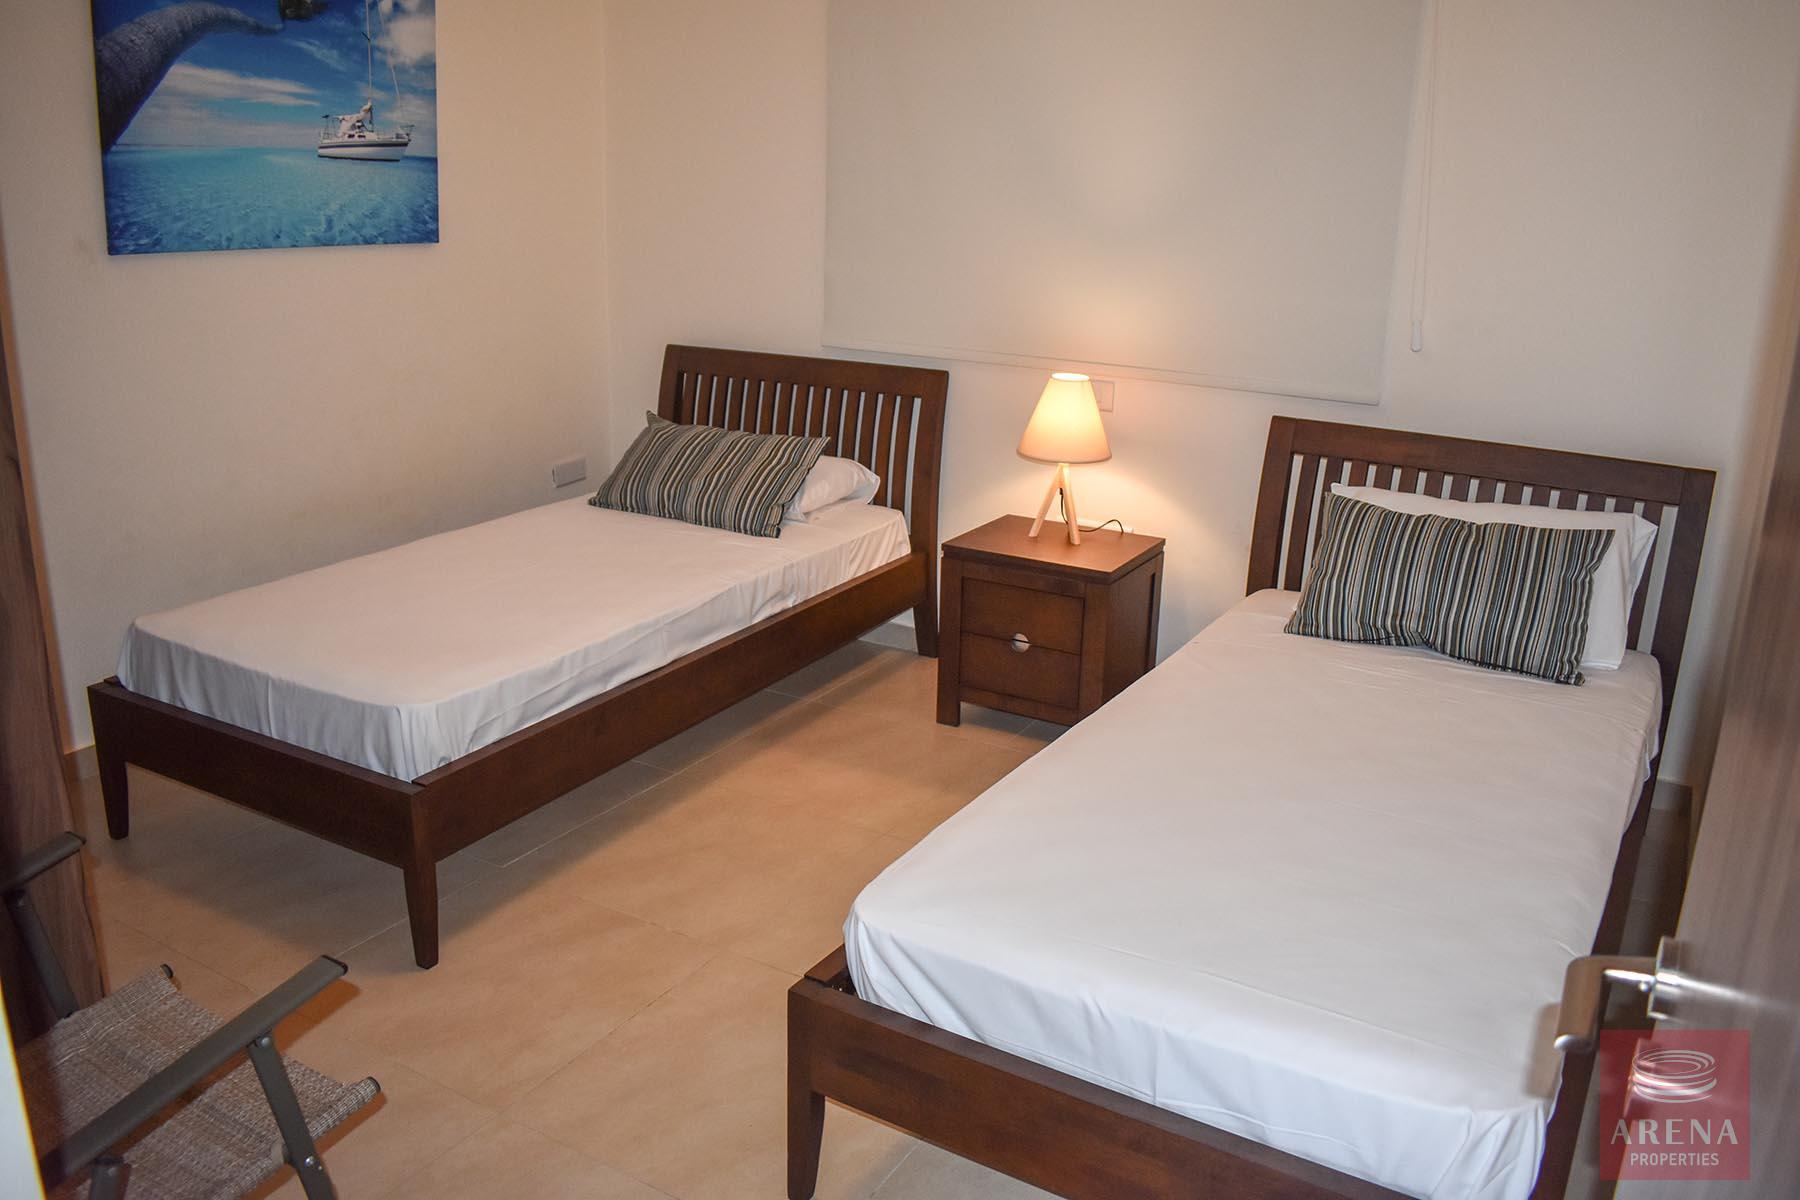 Ground Floor Apartment in Kapparis for sale - bedroom